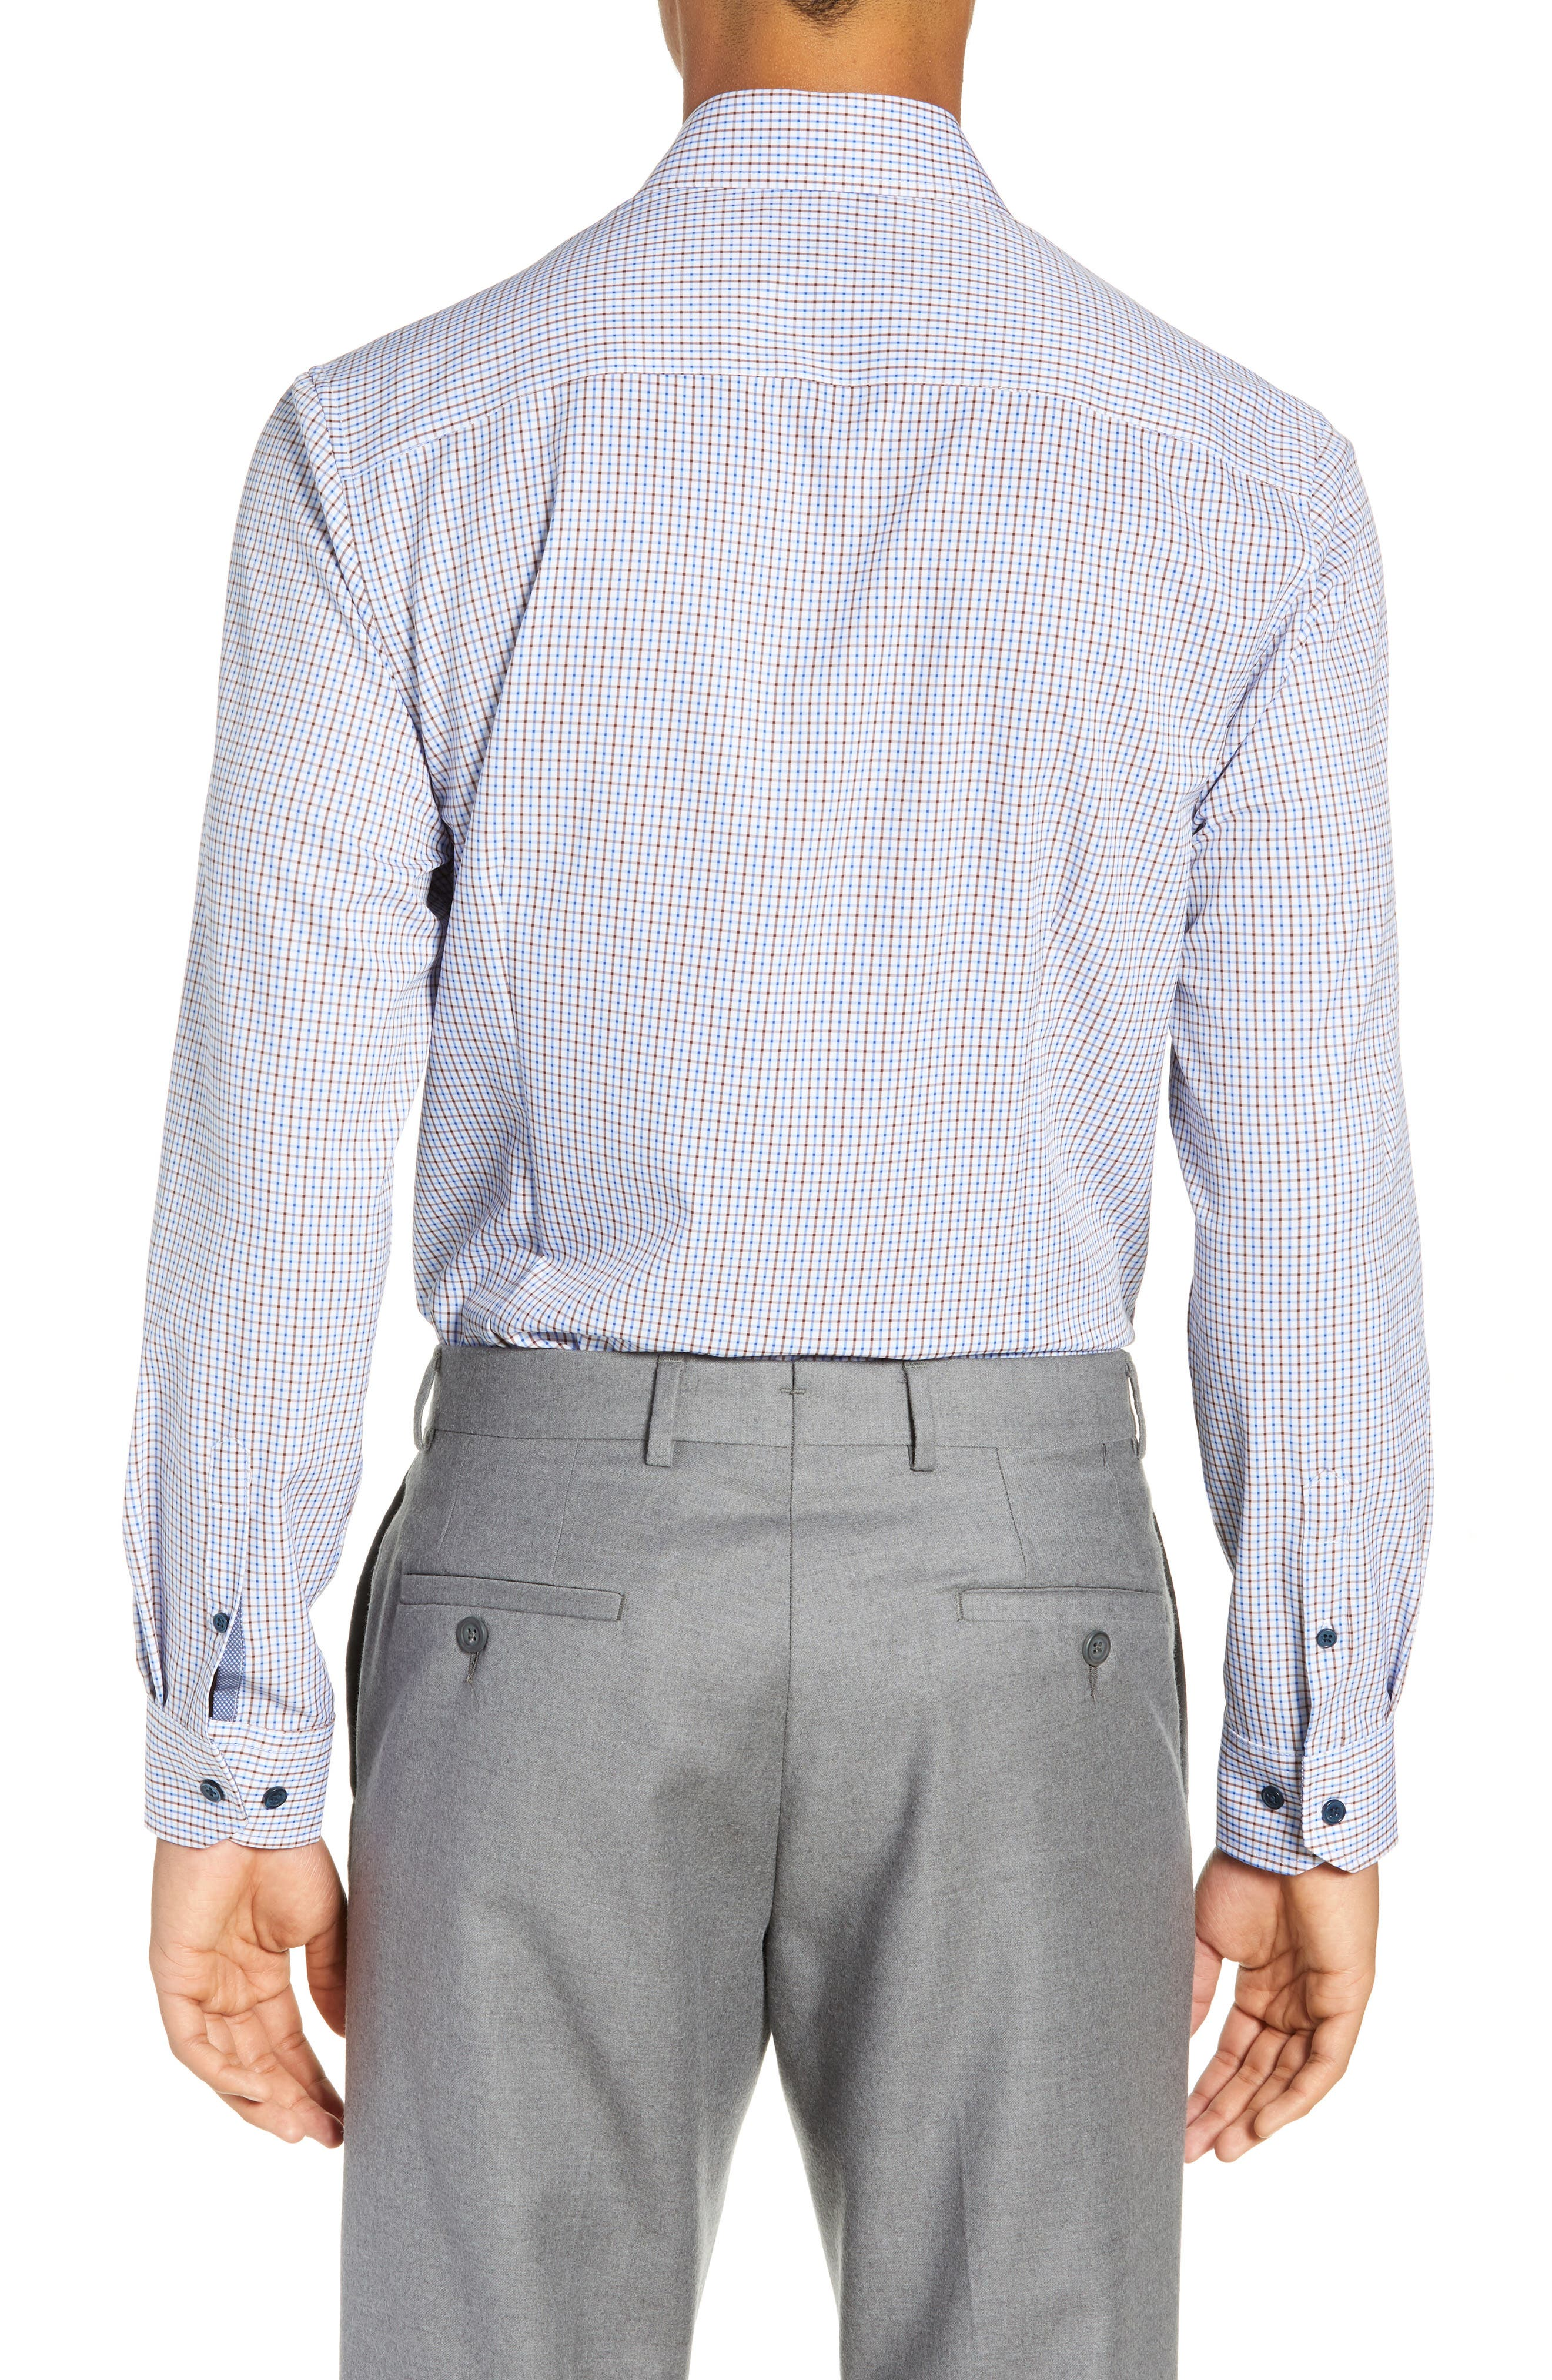 Trim Fit 4-Way Stretch Check Dress Shirt,                             Alternate thumbnail 3, color,                             BLUE